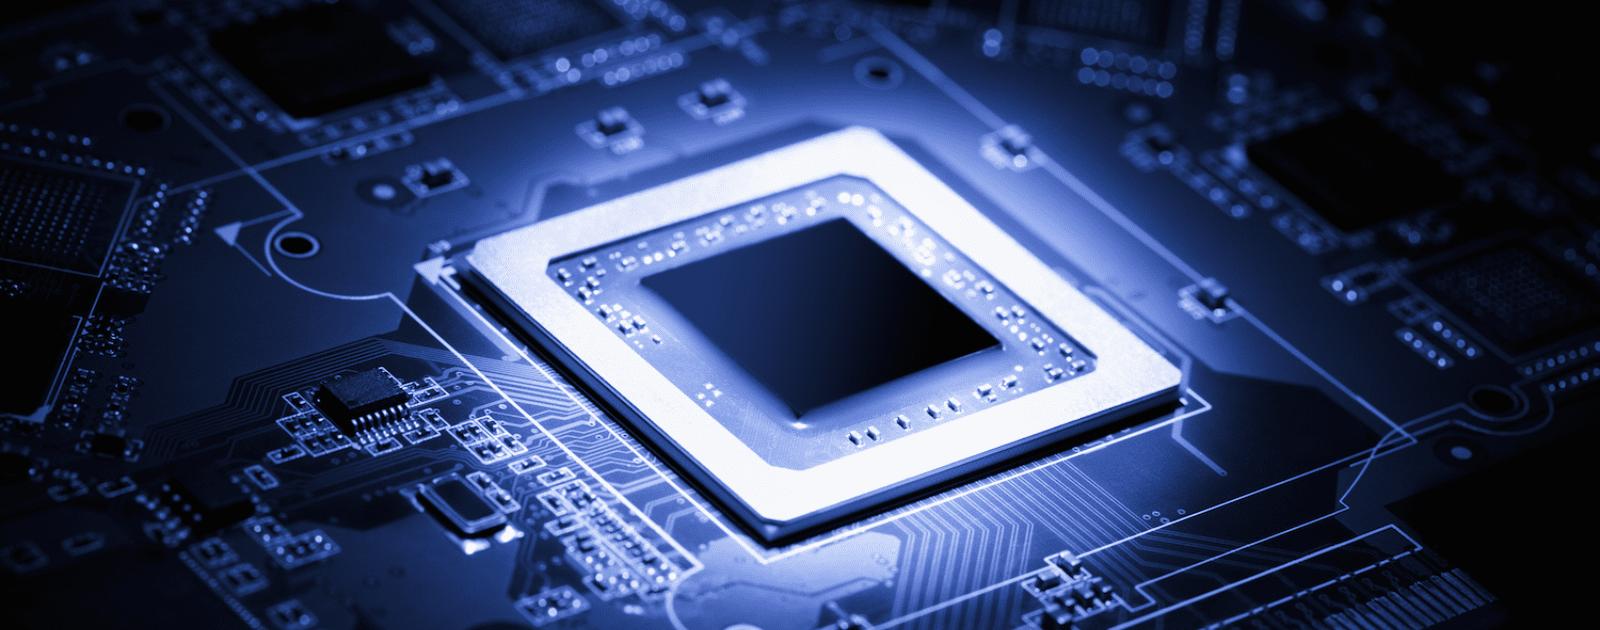 apple-a14-5nm-soc-benchmark-reveals-ipad-pro-like-performance